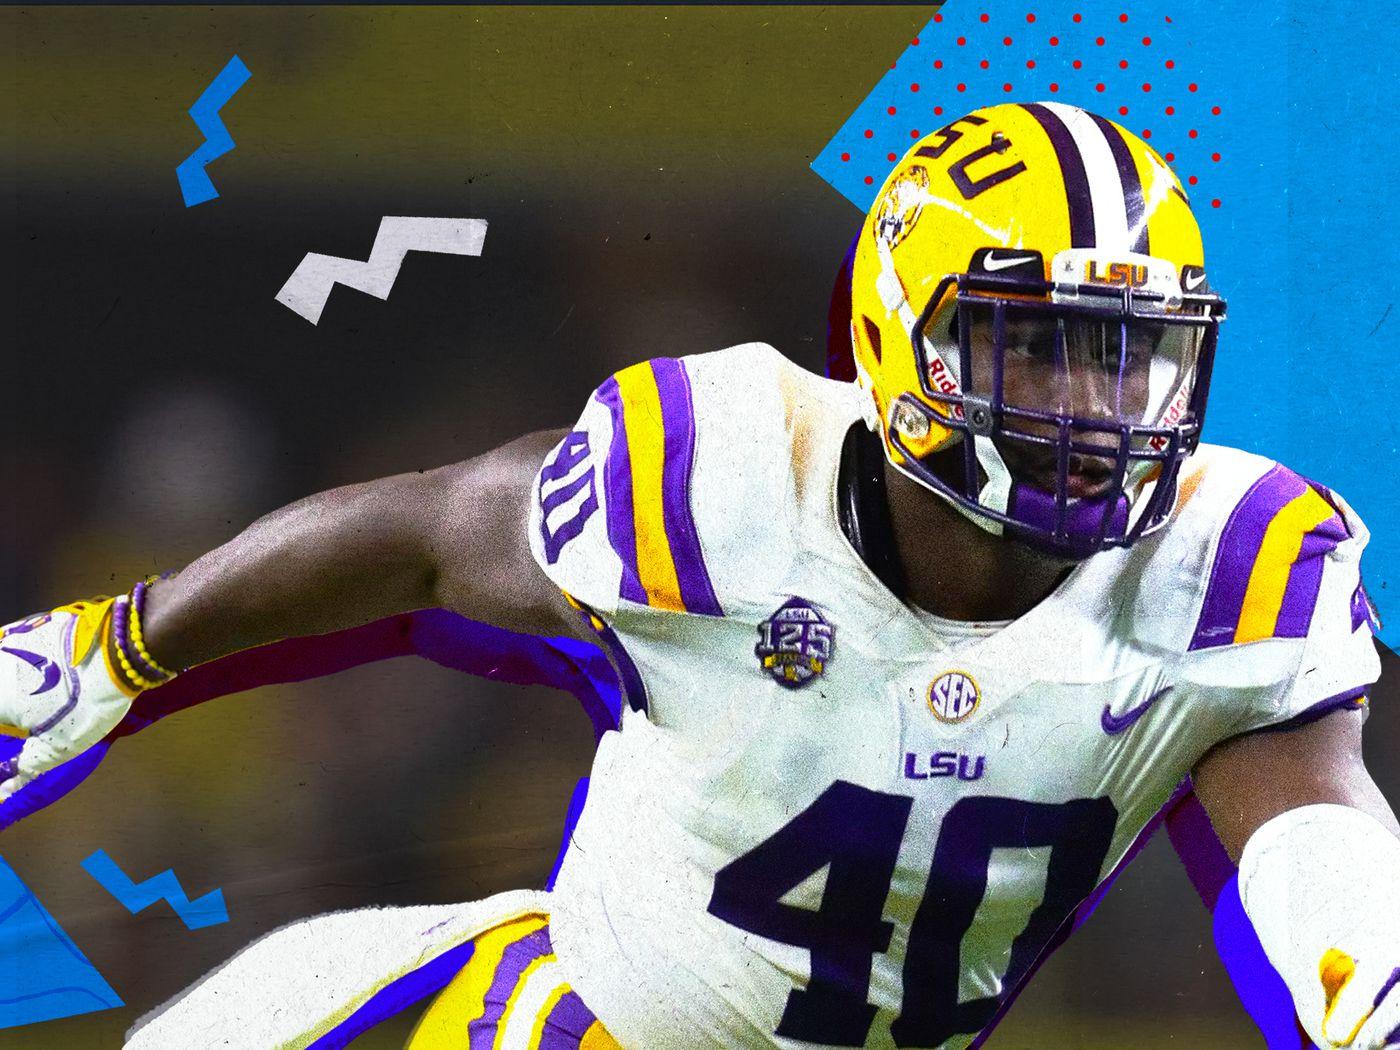 af0b47eea08ca2 2019 NFL mock draft: 3 rounds shows how deep the rookie class is -  SBNation.com